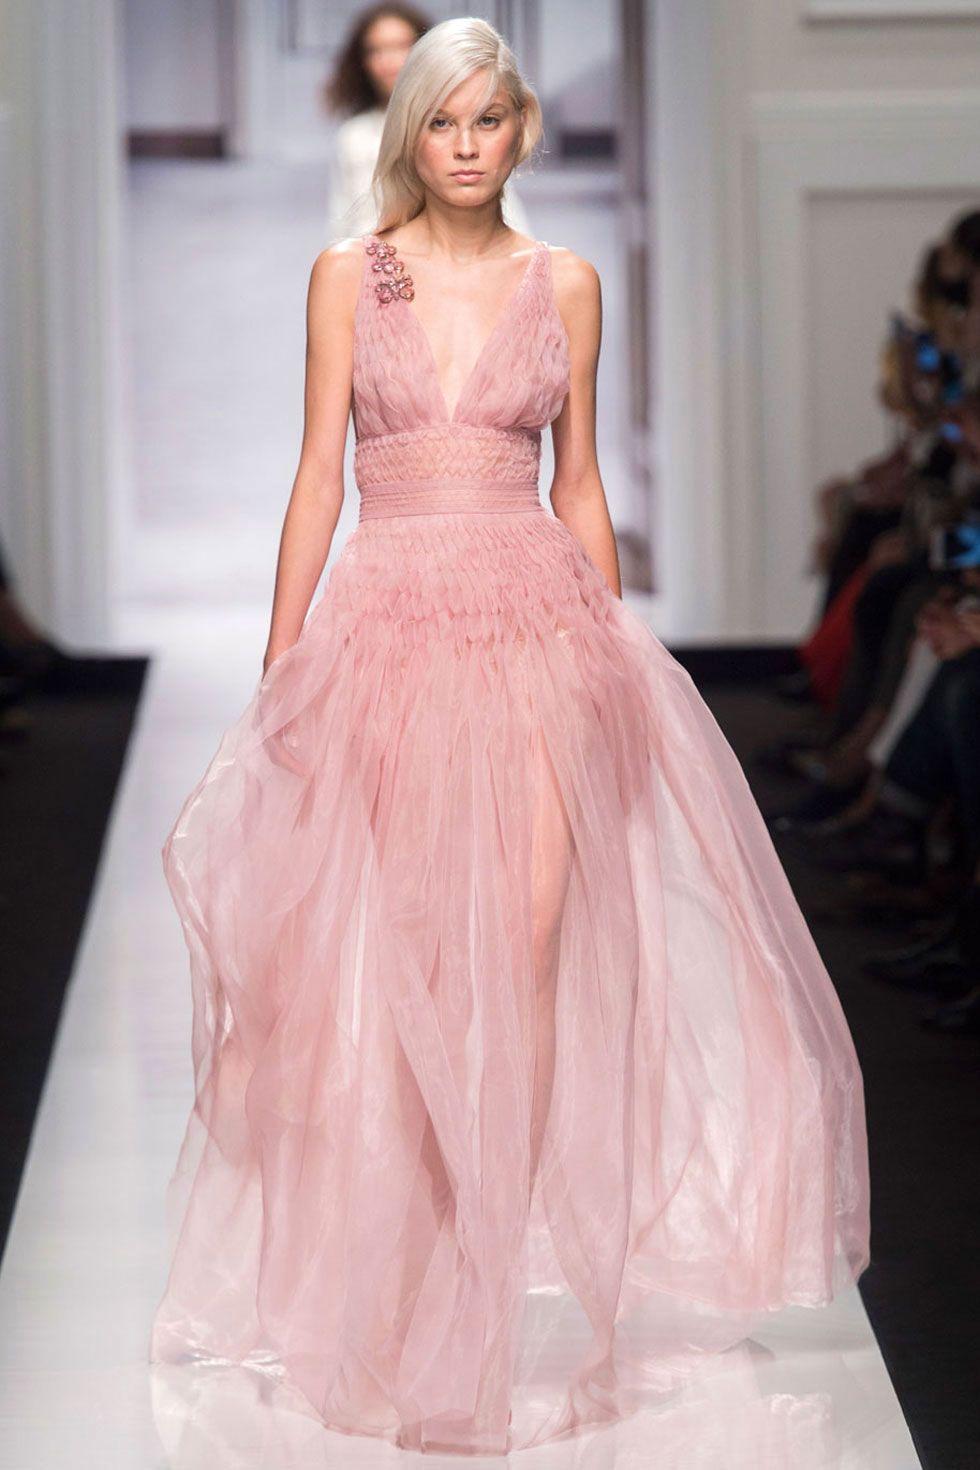 Luxury Kendra Wilkinson Wedding Dress Images - Colorful Wedding ...